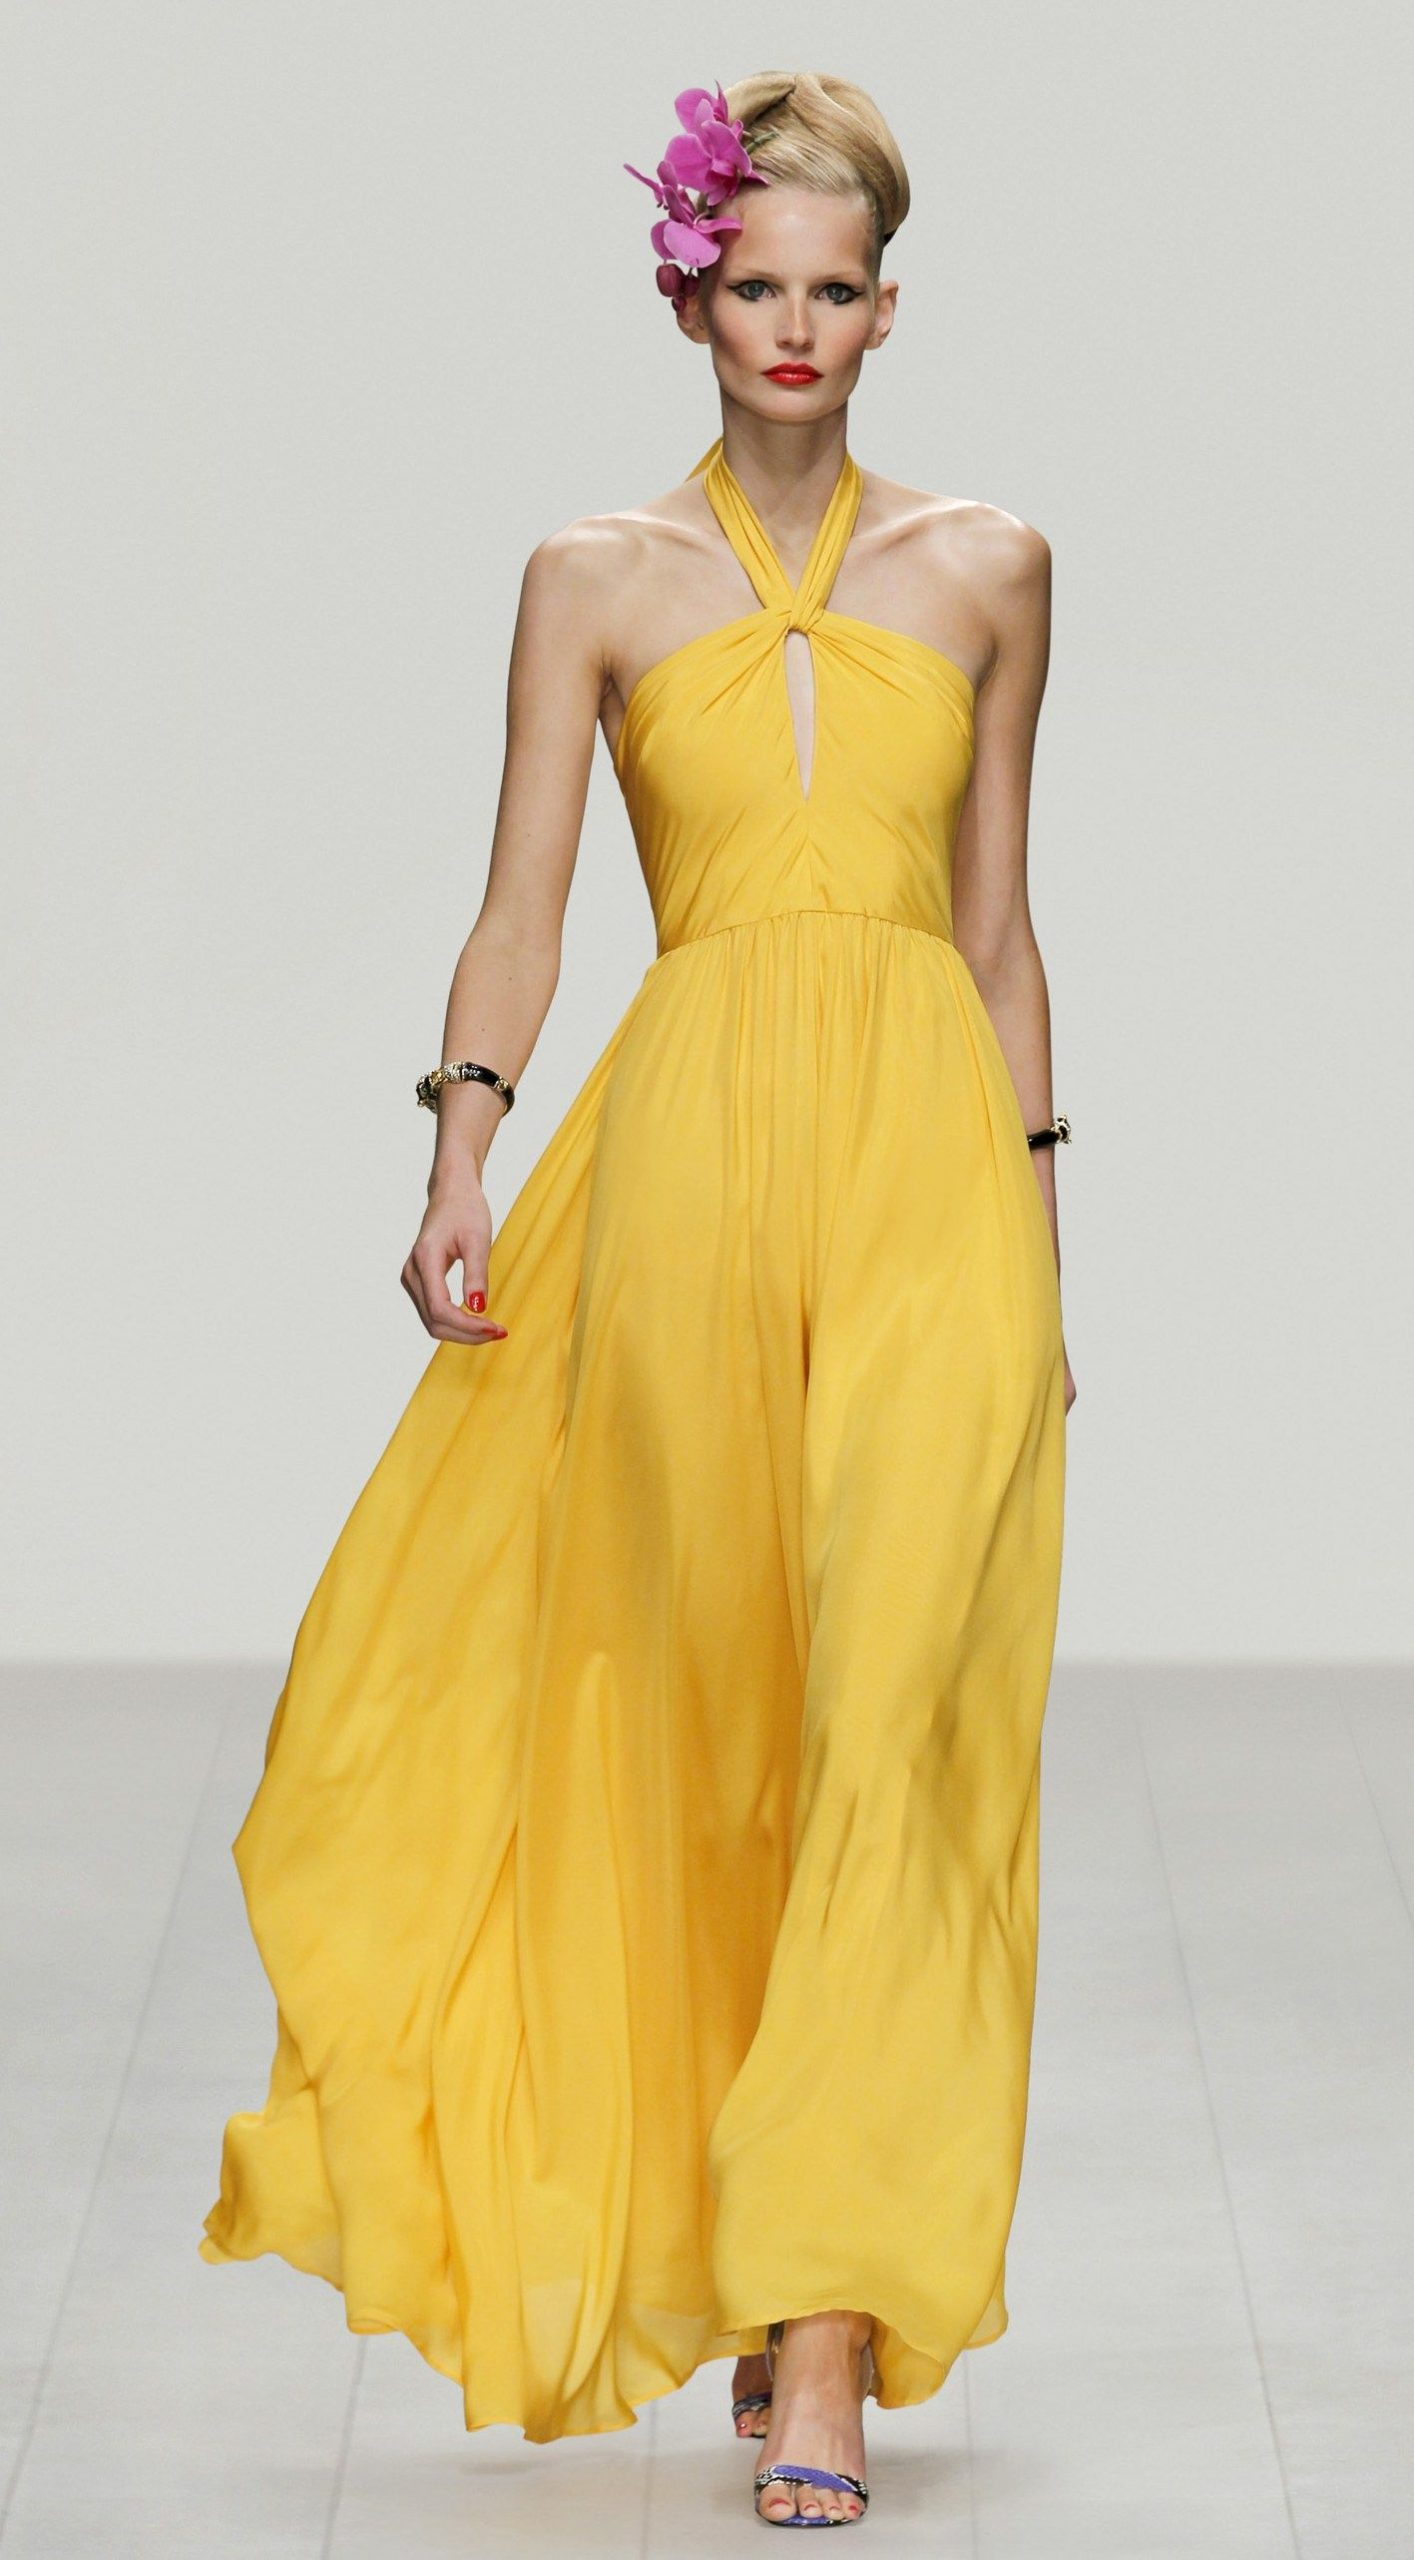 Formal Elegant Gelbe Abend Kleider SpezialgebietAbend Fantastisch Gelbe Abend Kleider Ärmel